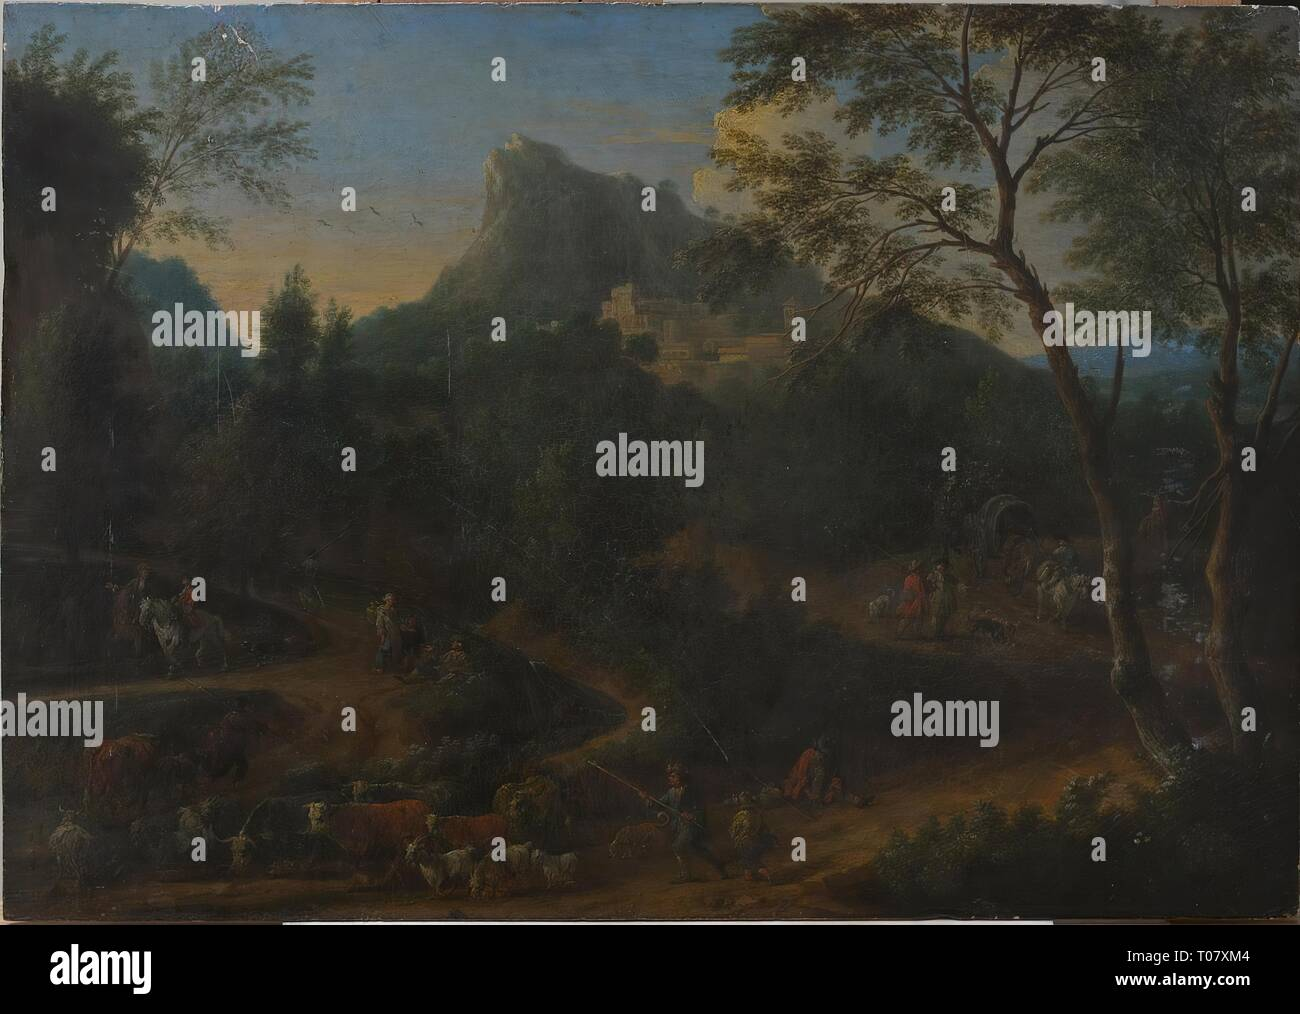 Dutch Painting 18th Century Stock Photos & Dutch Painting